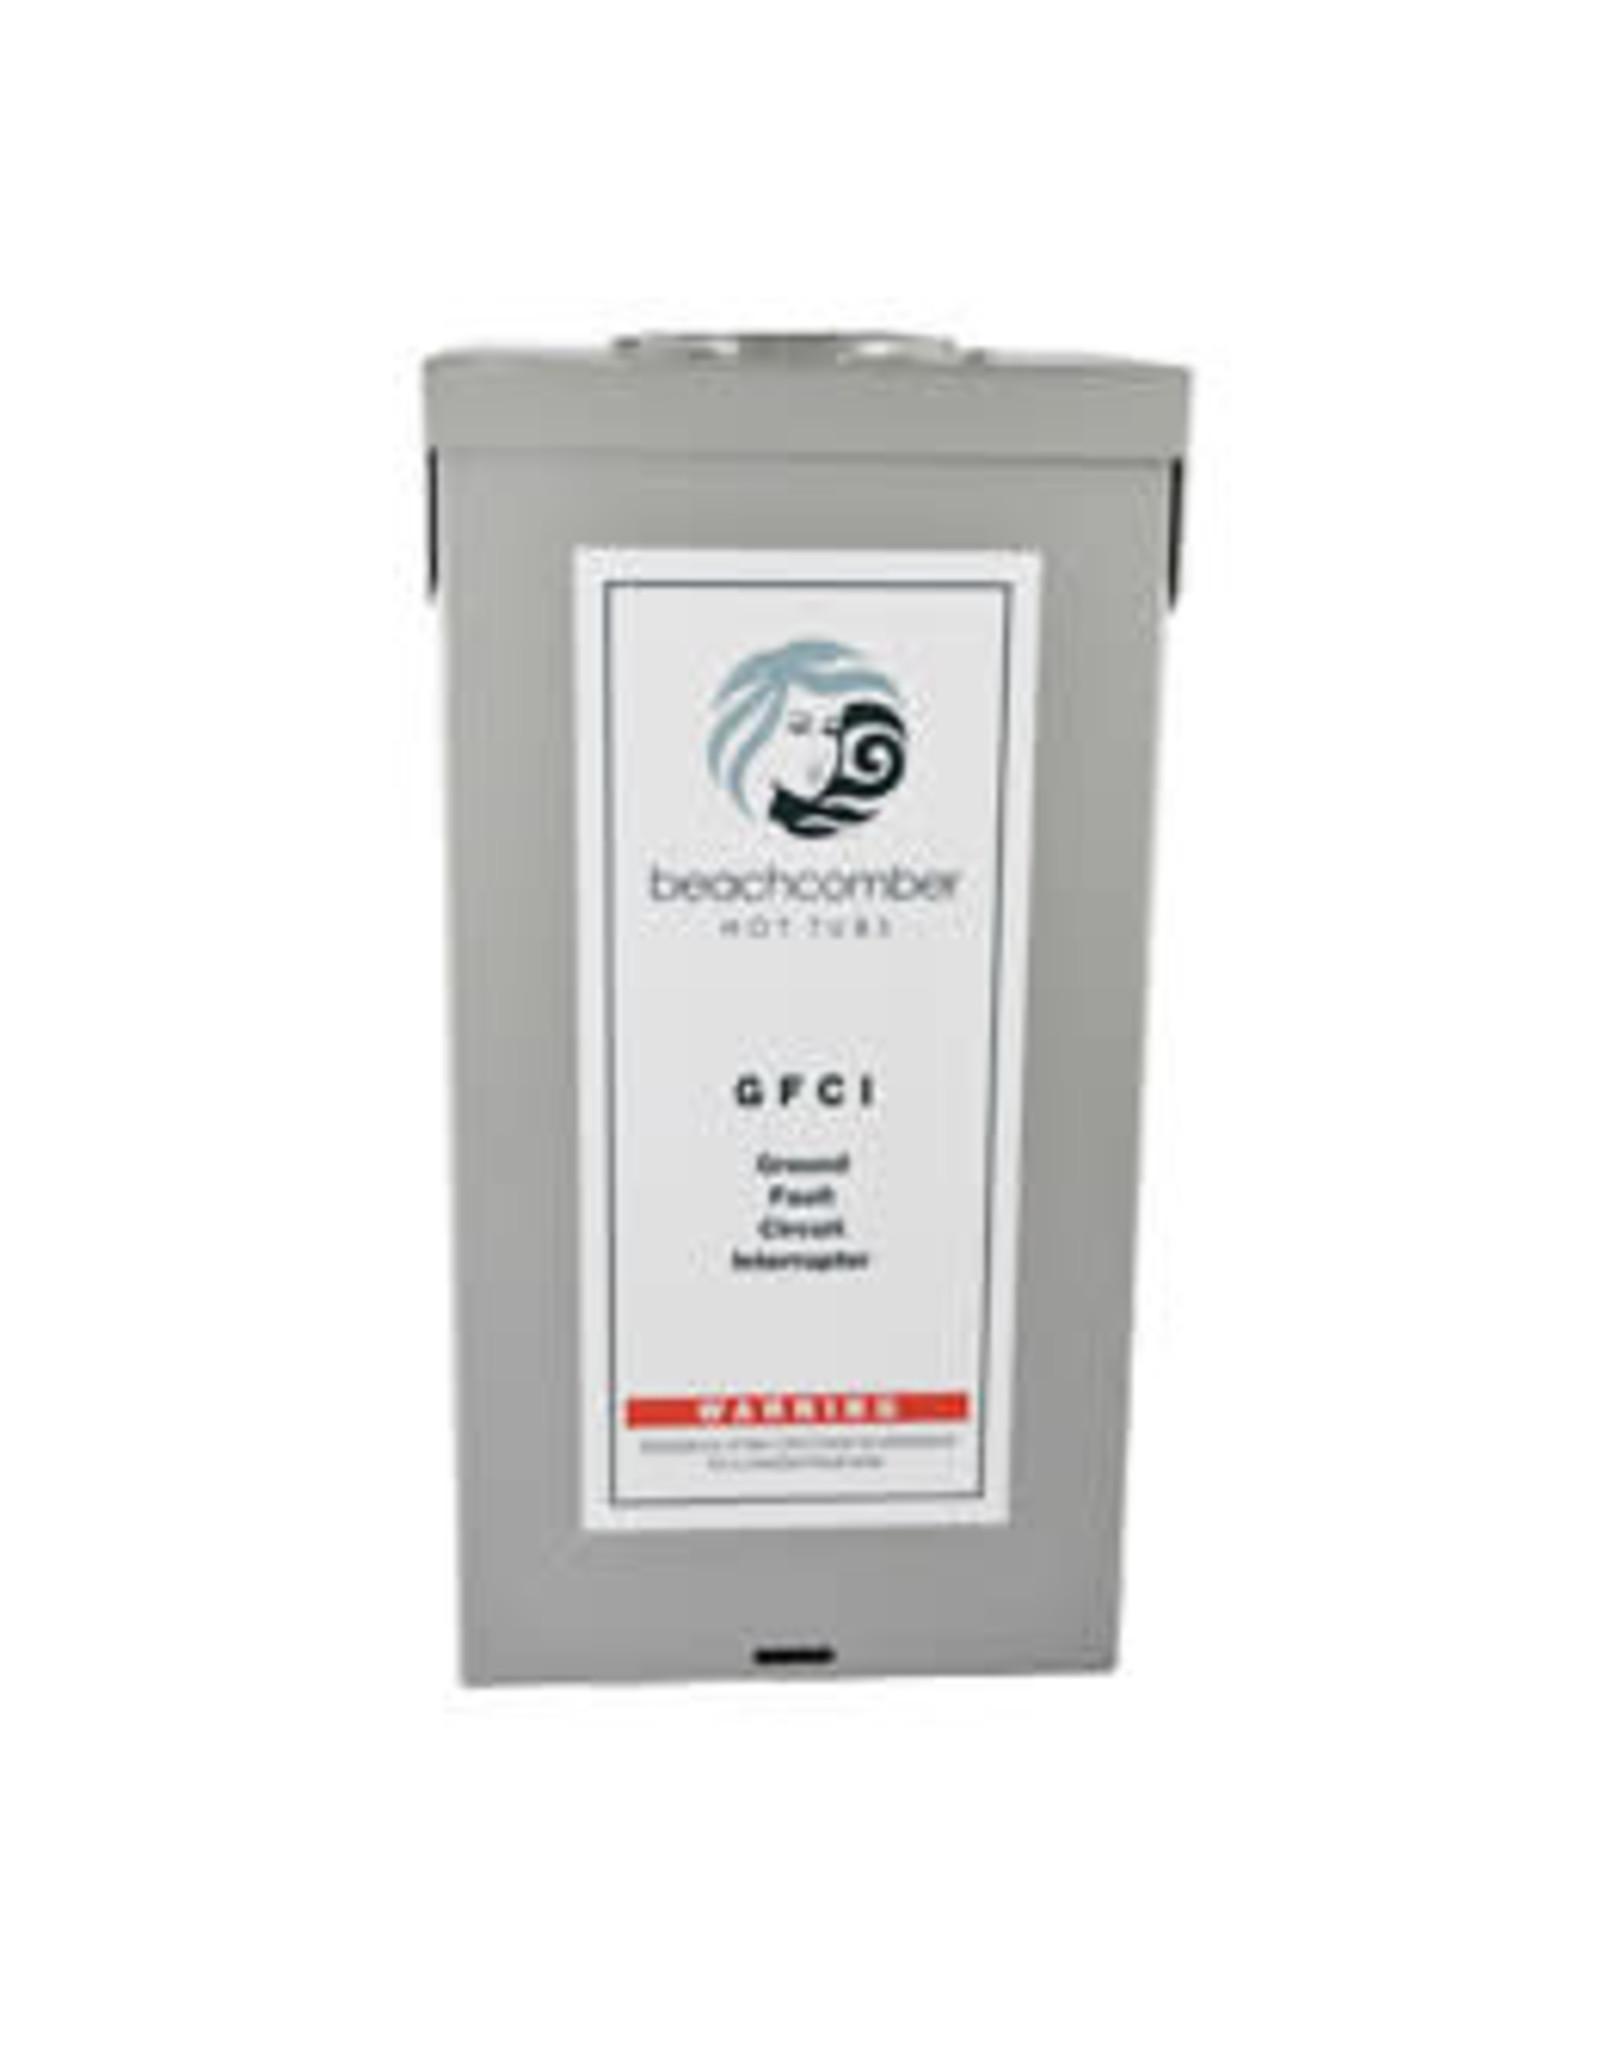 BEACHCOMBER BEACHCOMBER GFCI 60 AMP